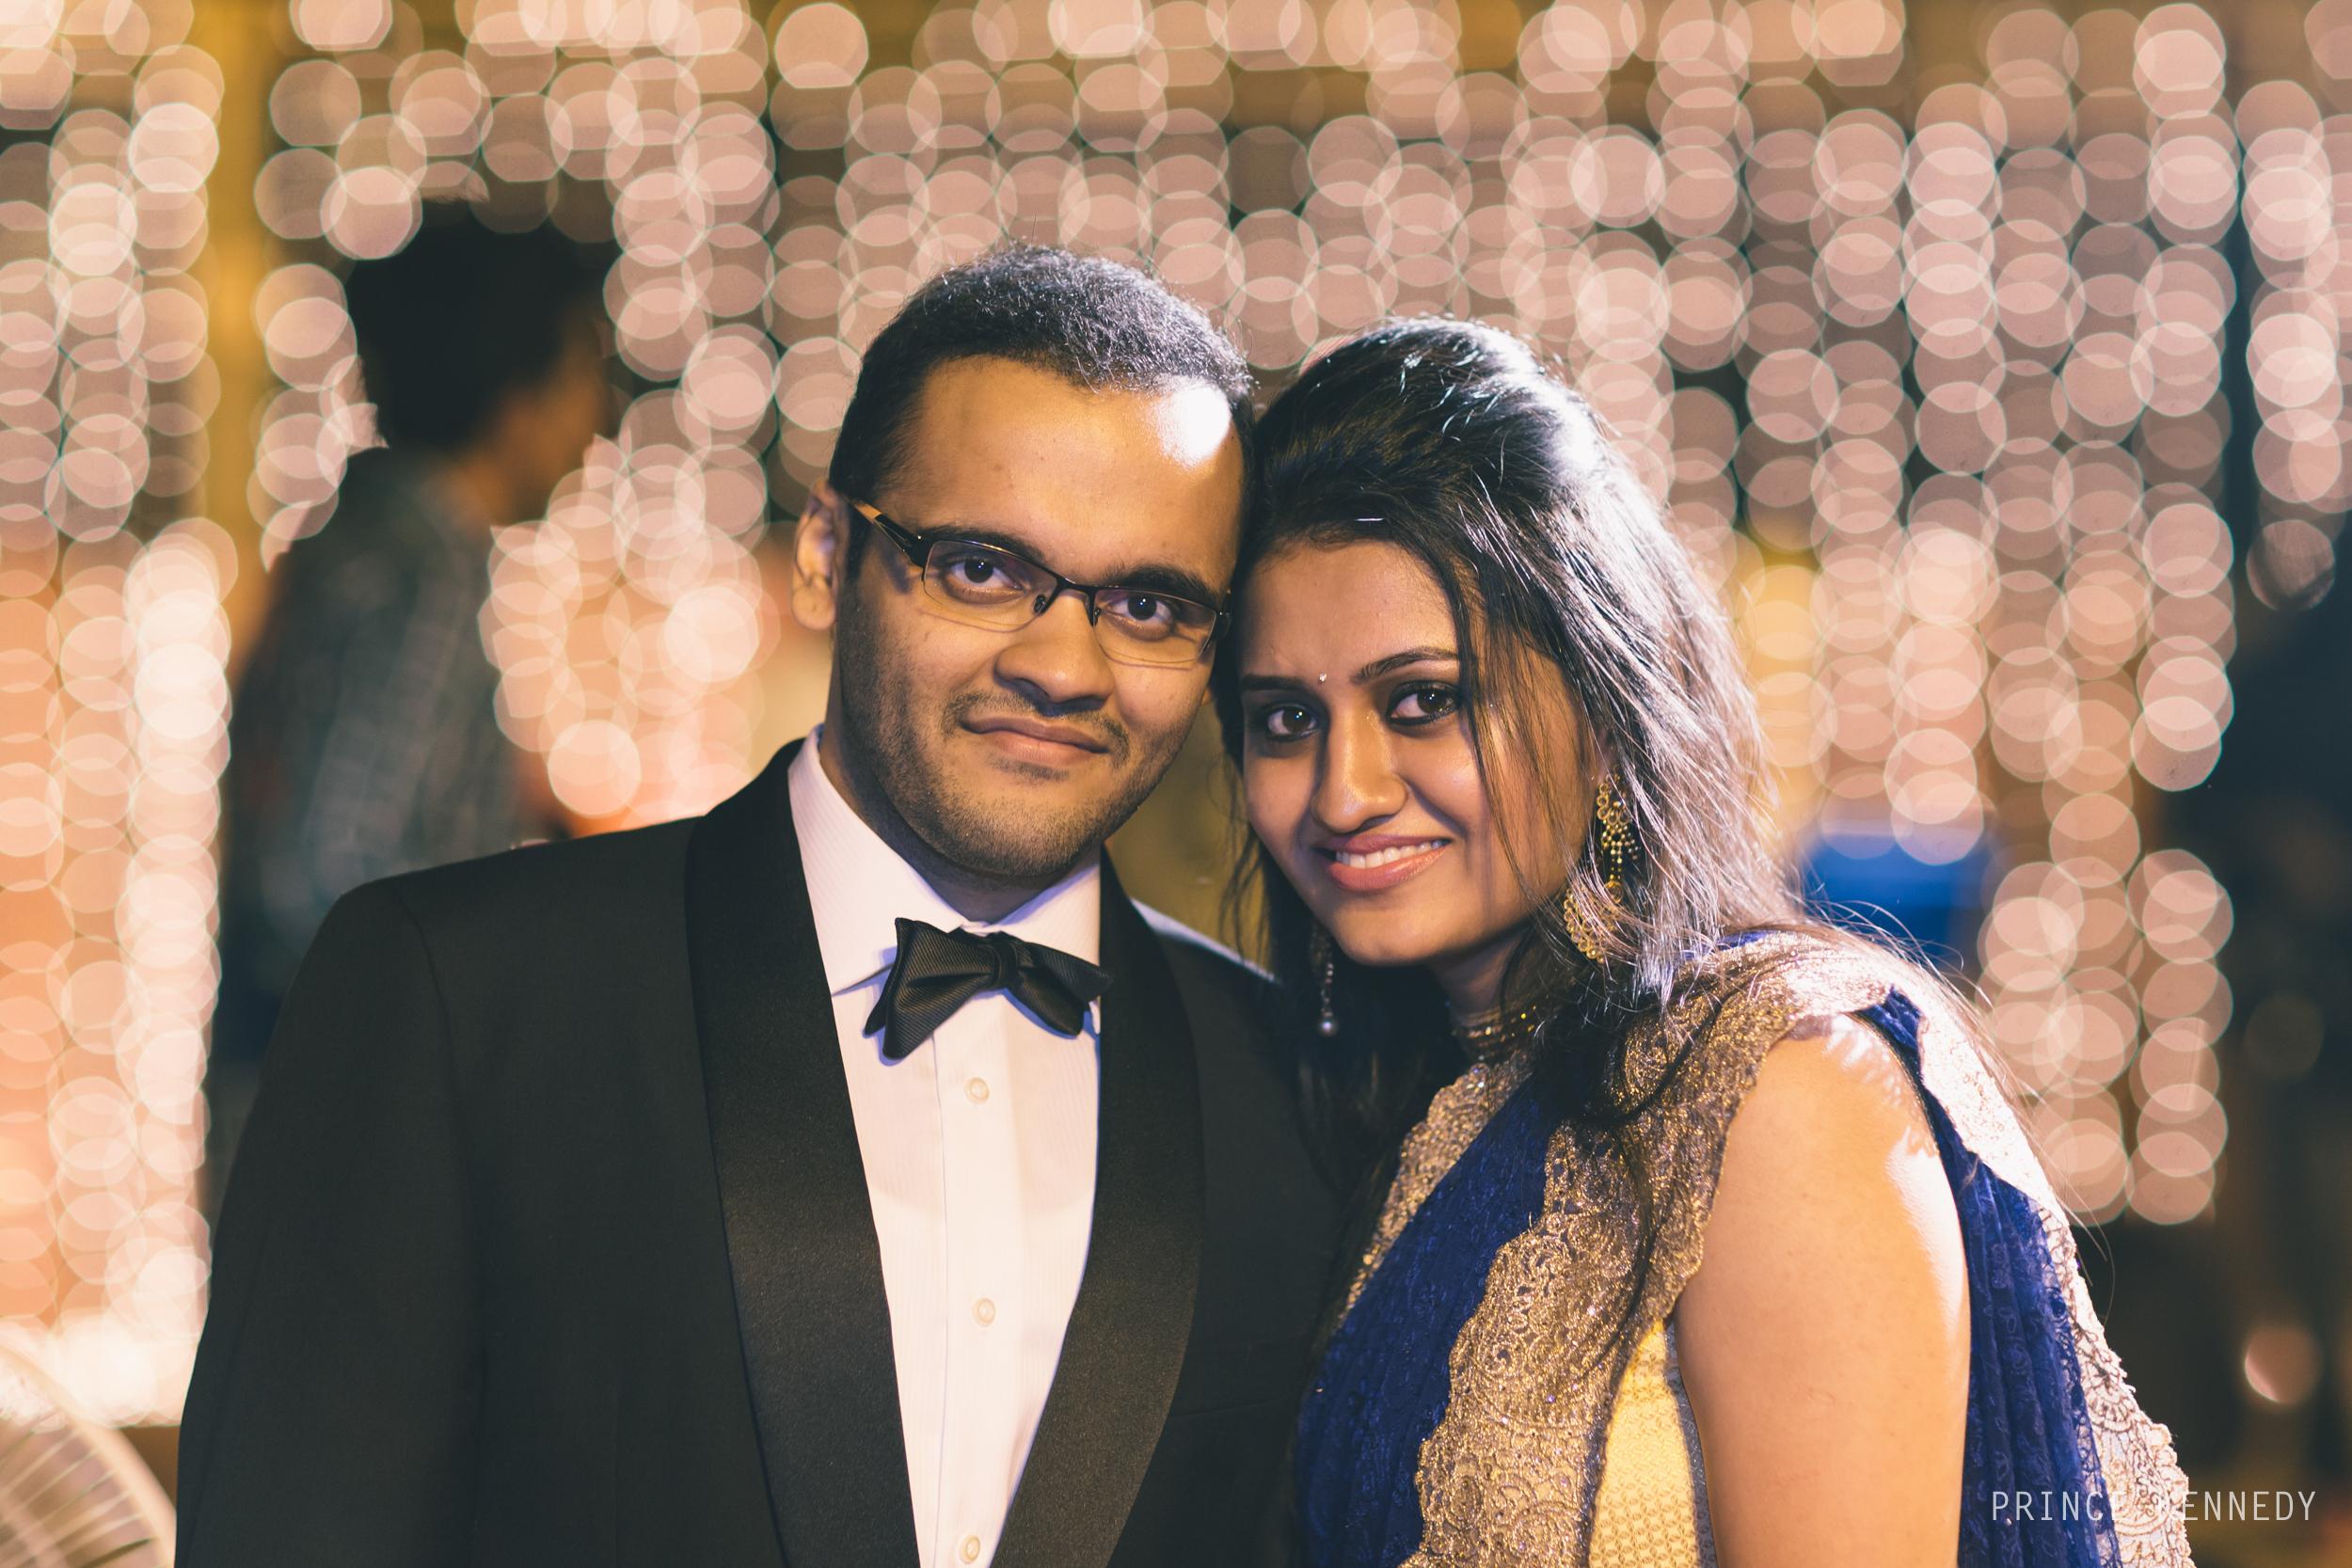 Athmajja-Nithesh-Engagement-Couple-Portrait-Portraiture-Wedding-Couple-Portrait-Chennai-Photographer-Candid-Photography-Destination-Best-Prince-Kennedy-Photography-115.jpg